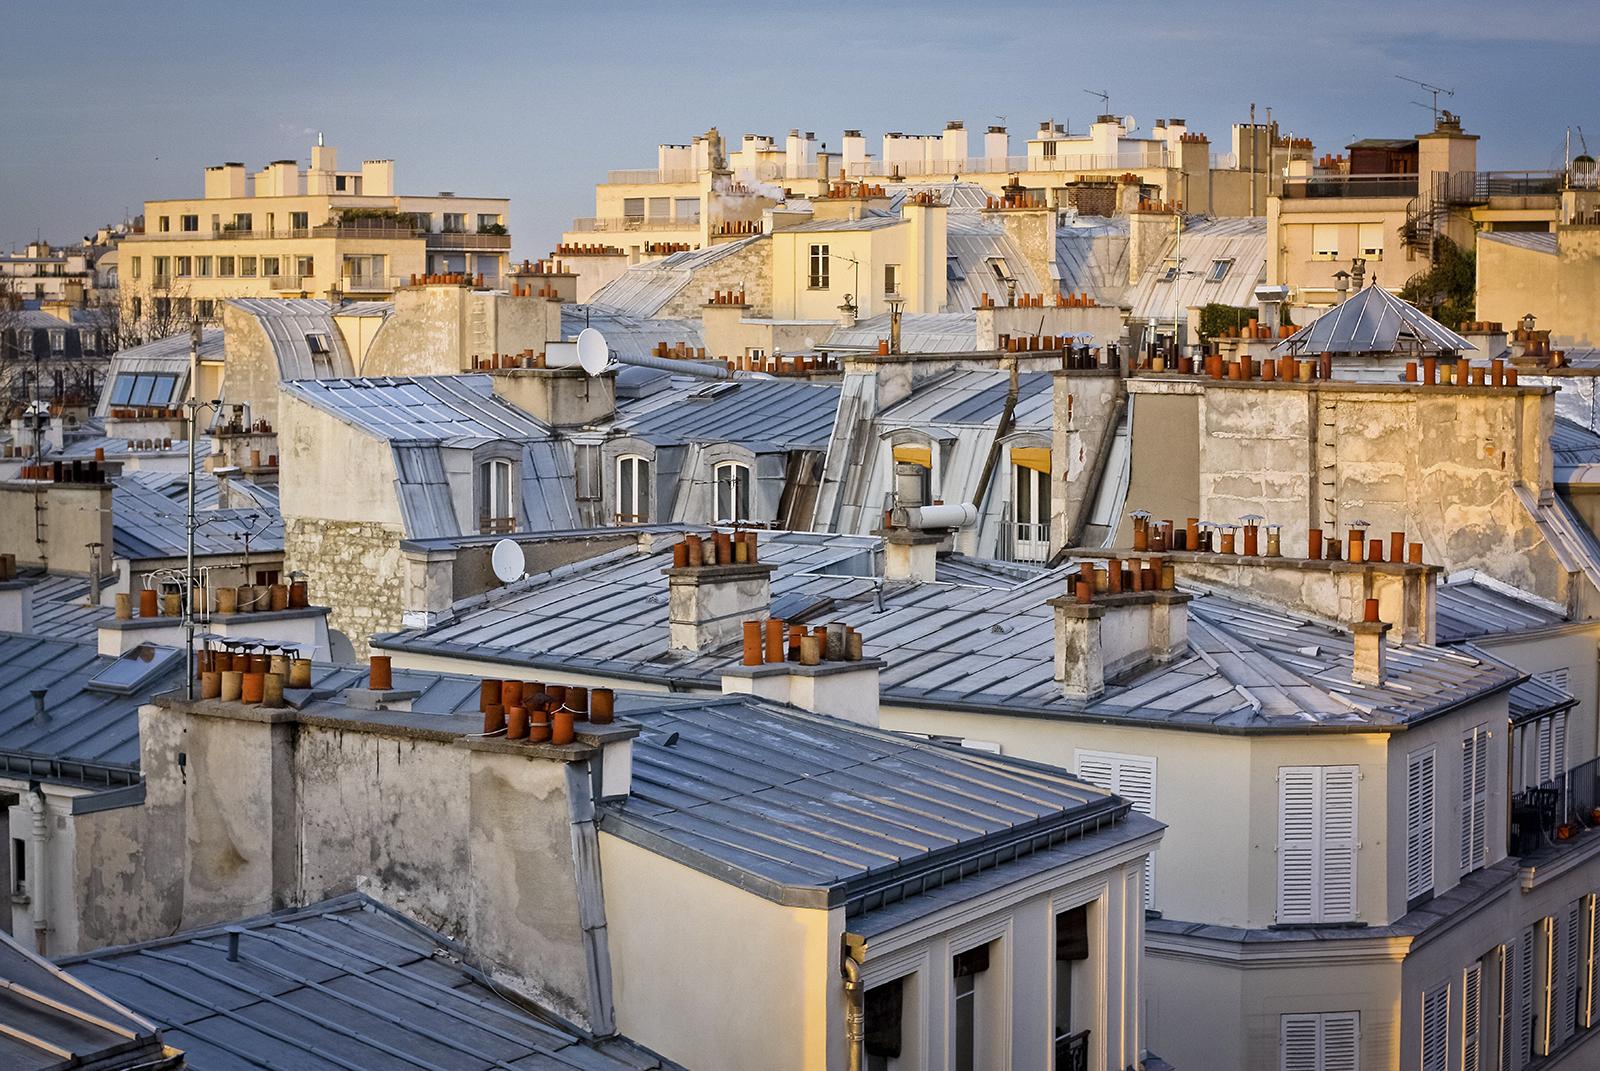 Paris Roof Tops